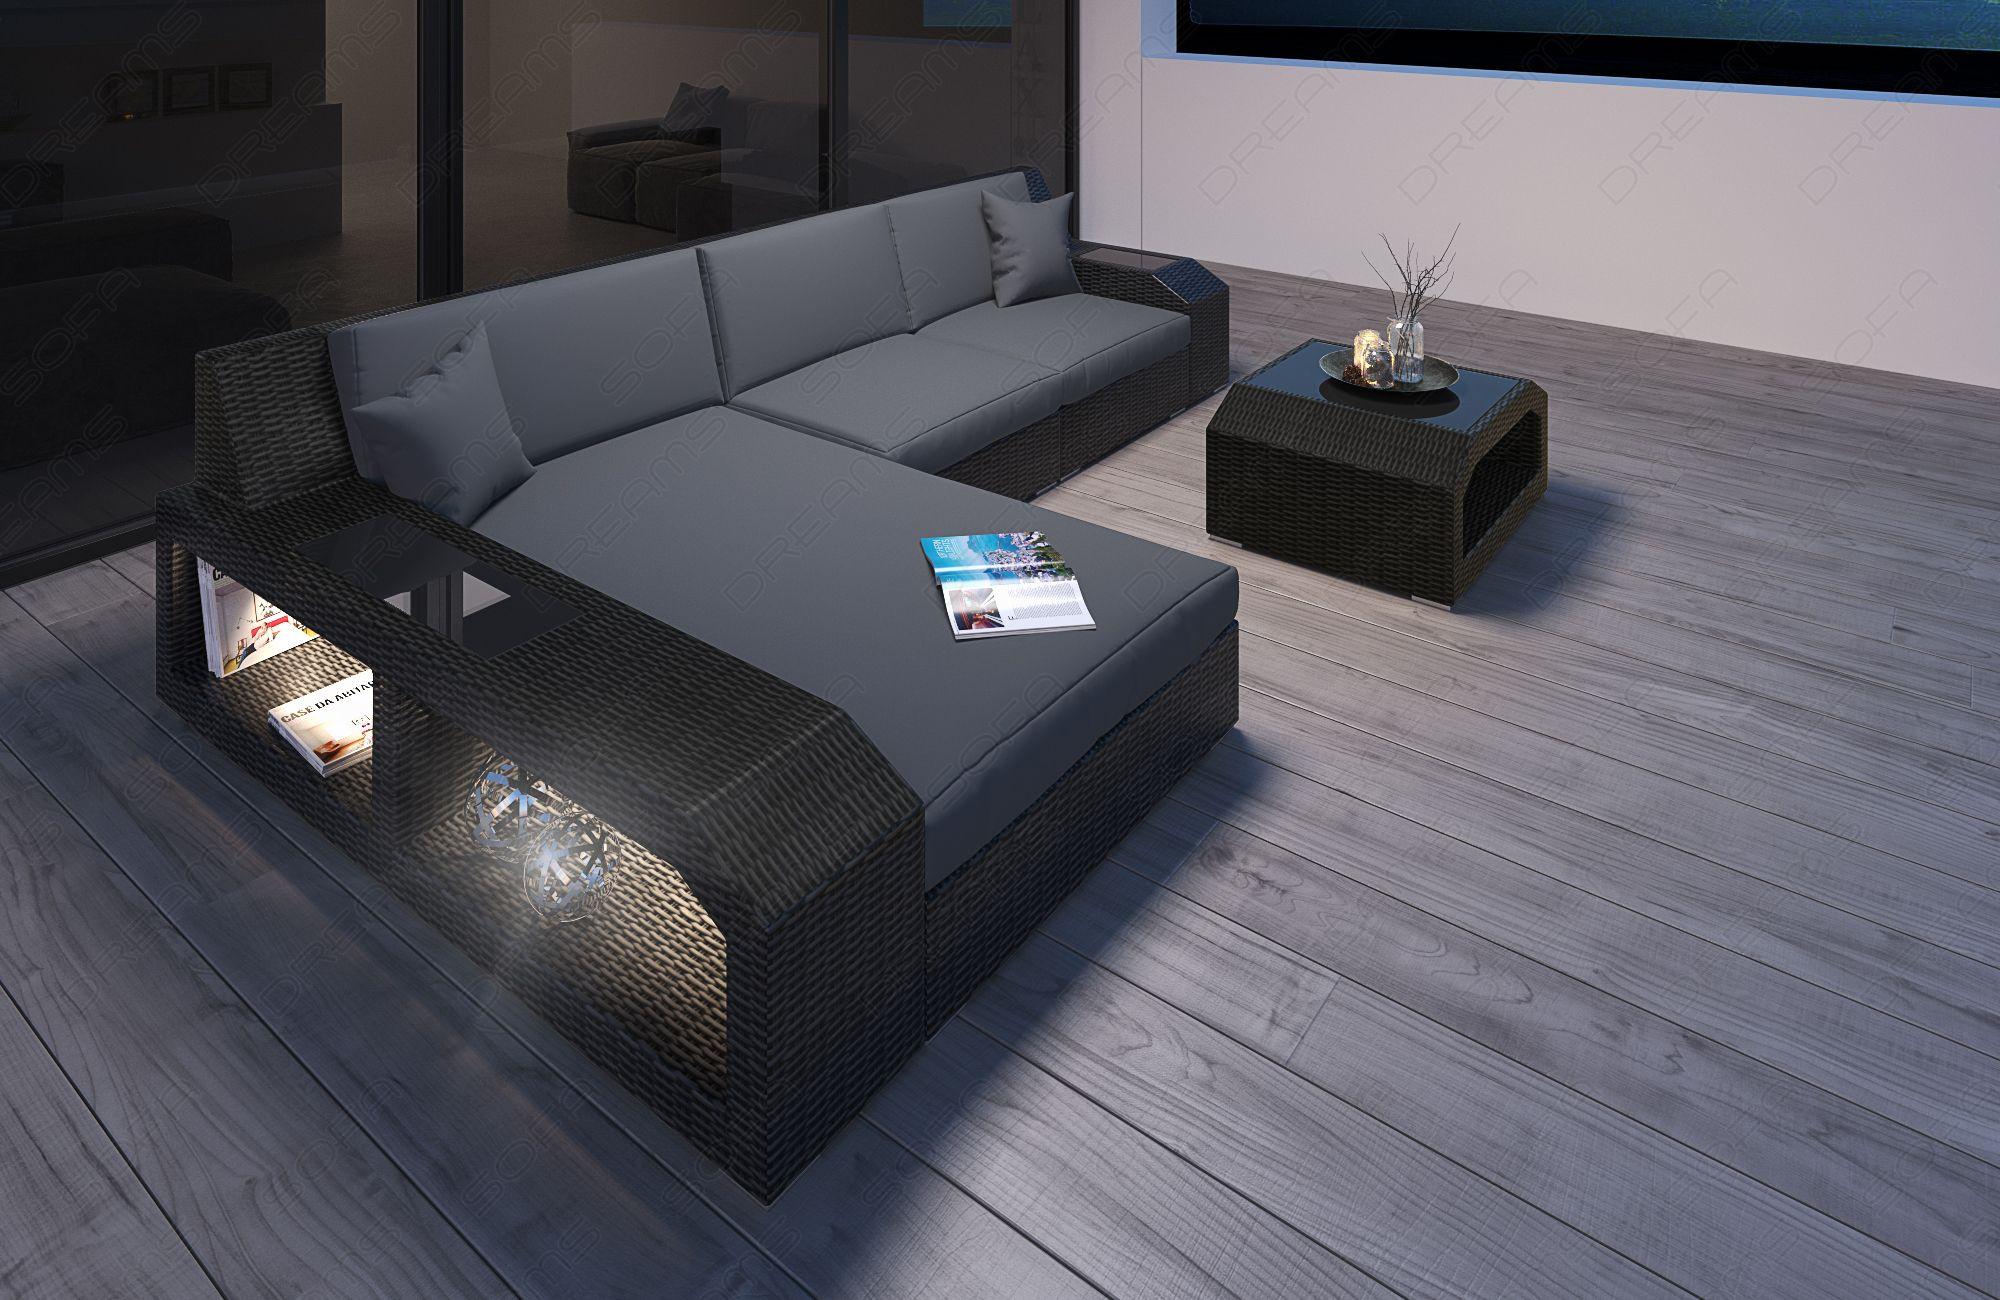 Wicker Patio Sofa Houston L with LED black-grey